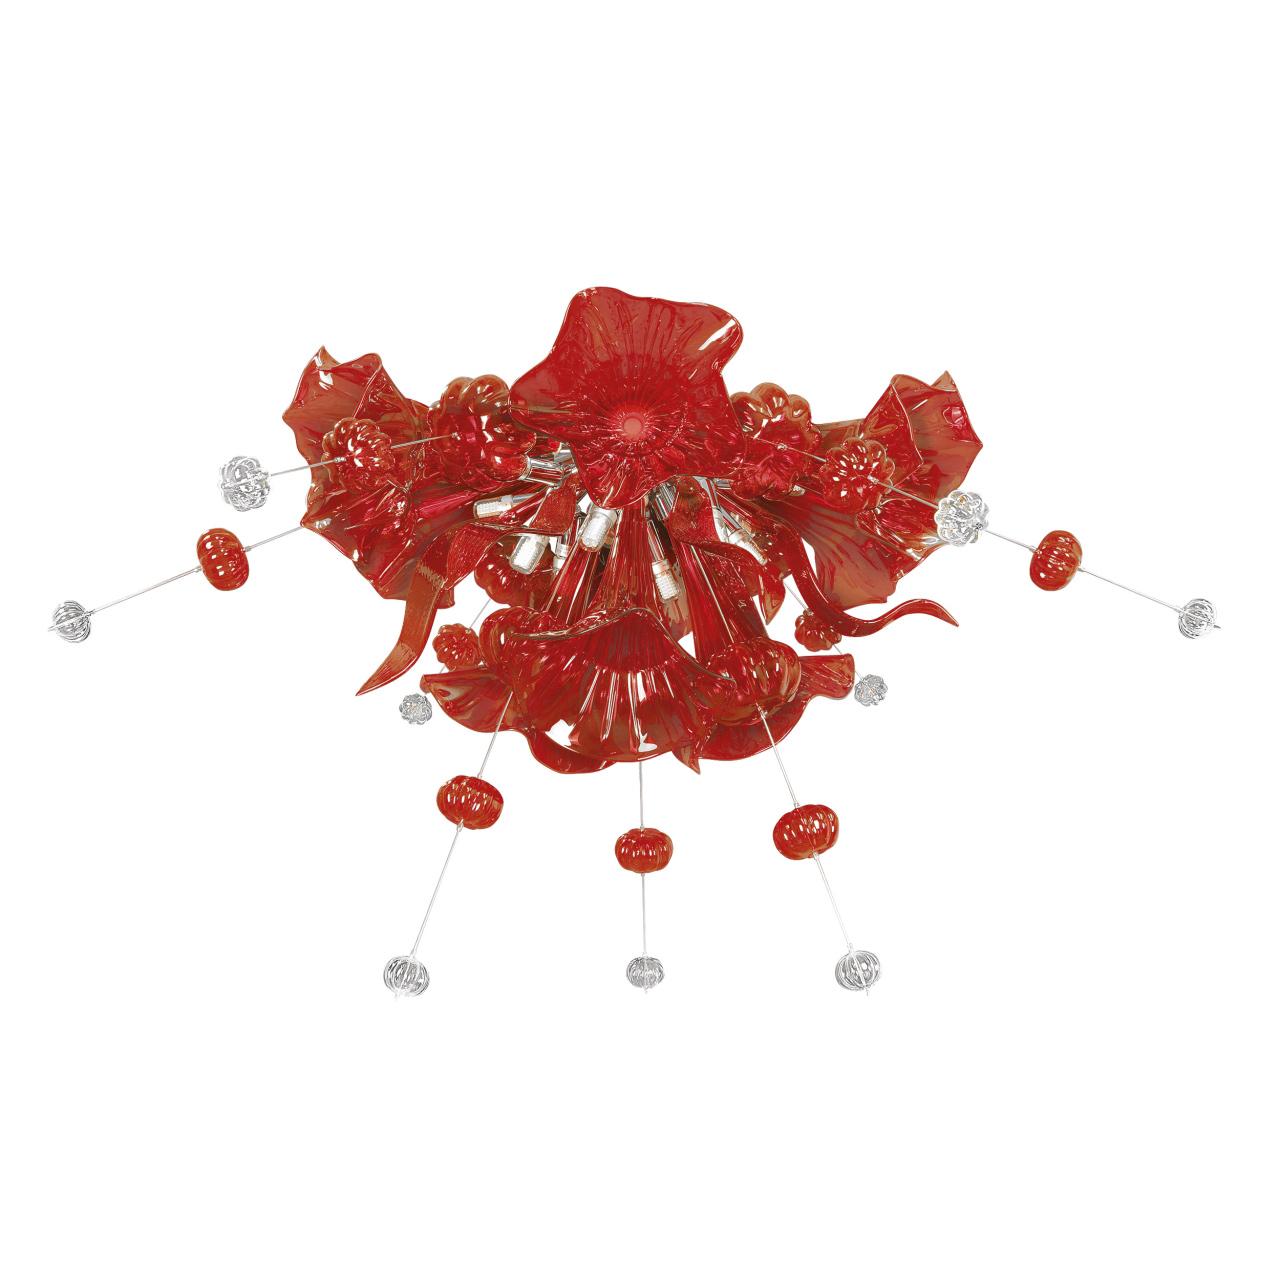 Люстра потолочная Celesta 12х6W (Led) G9 красный Lightstar 893022